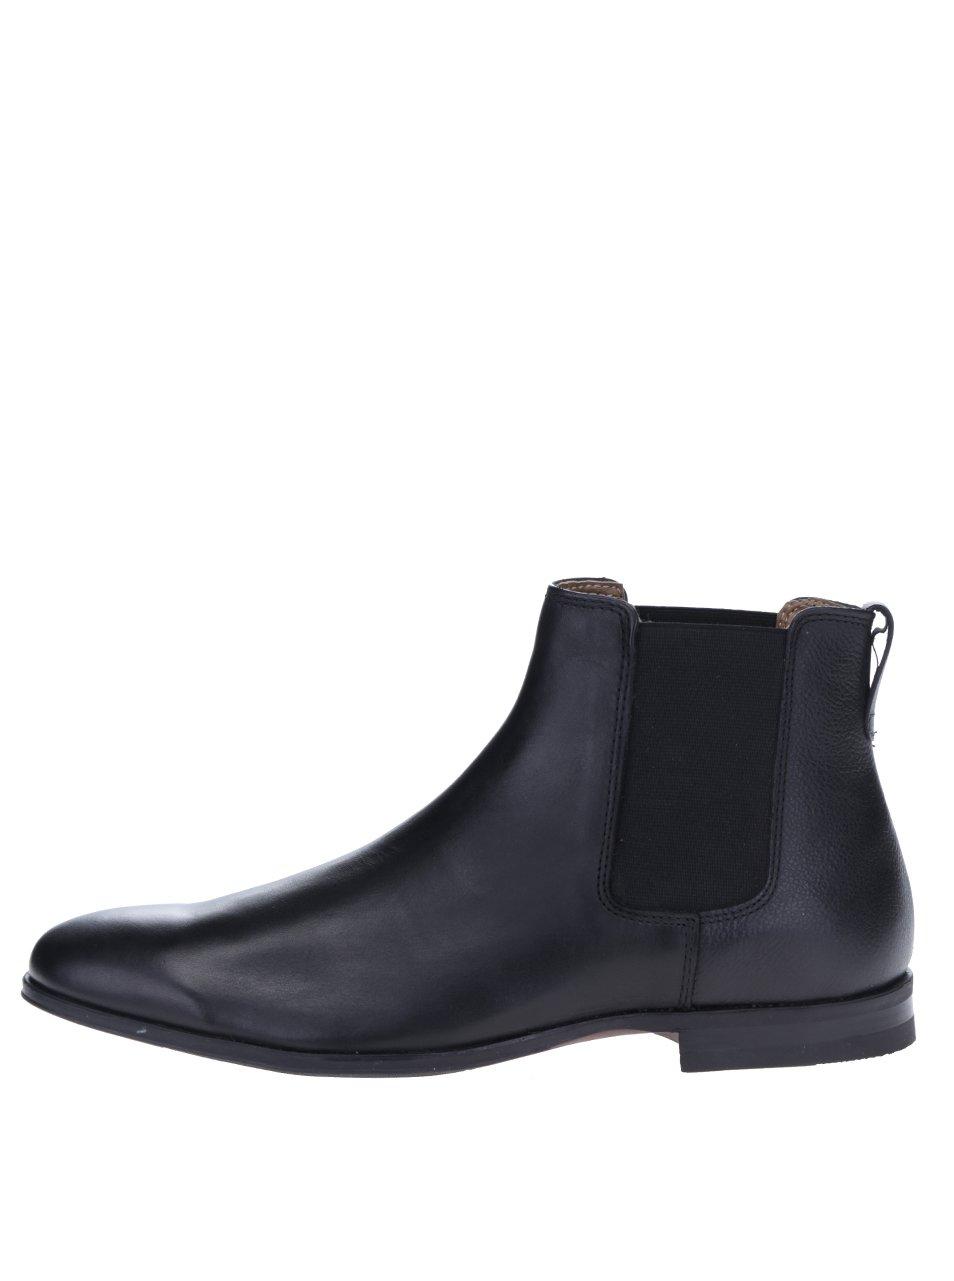 Černé kožené chelsea boty Burton Menswear London